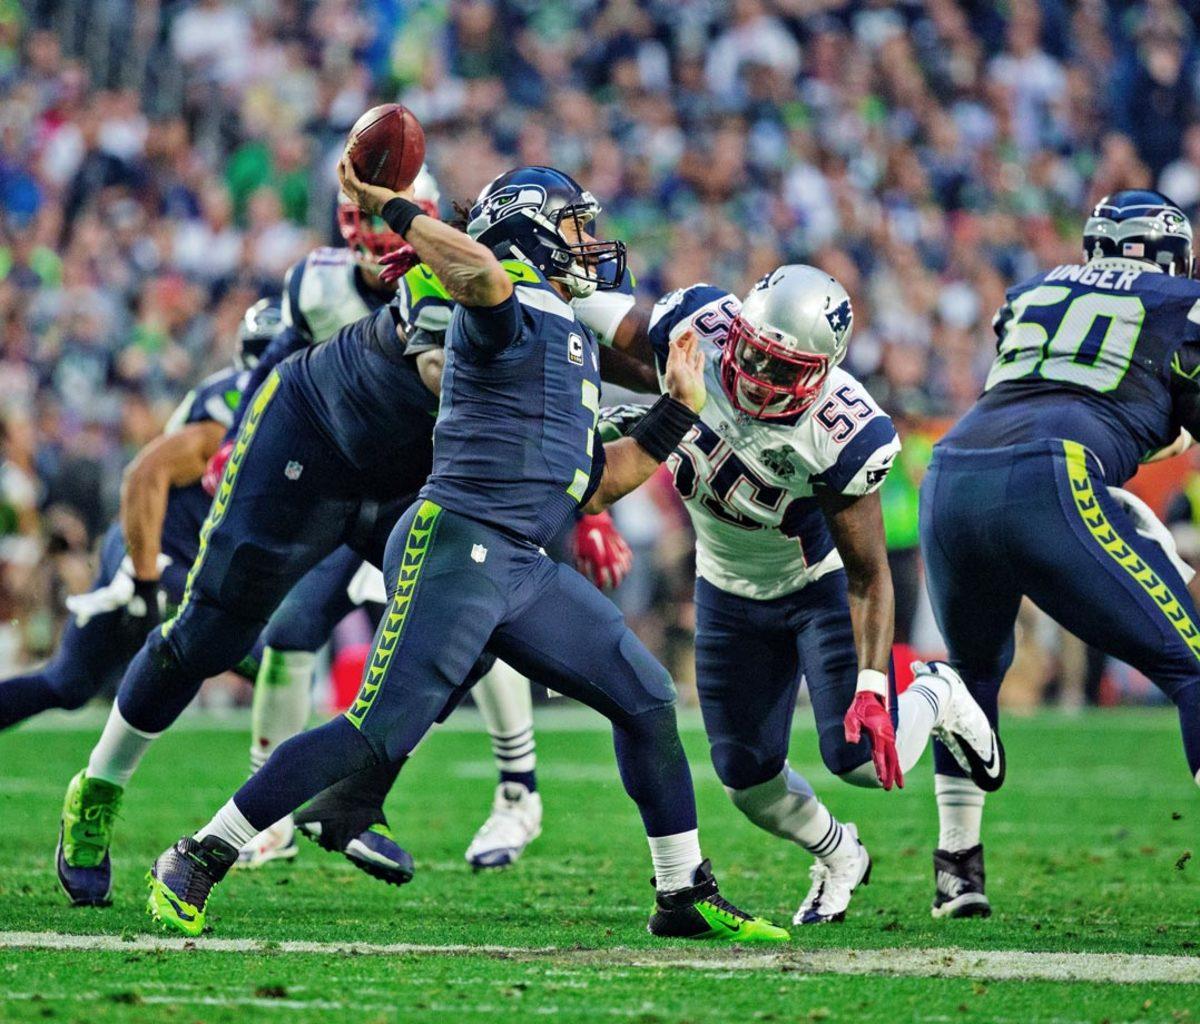 2015-0201-Russell-Wilson-Super-Bowl-XLIX-X159212_TK1_1740.jpg